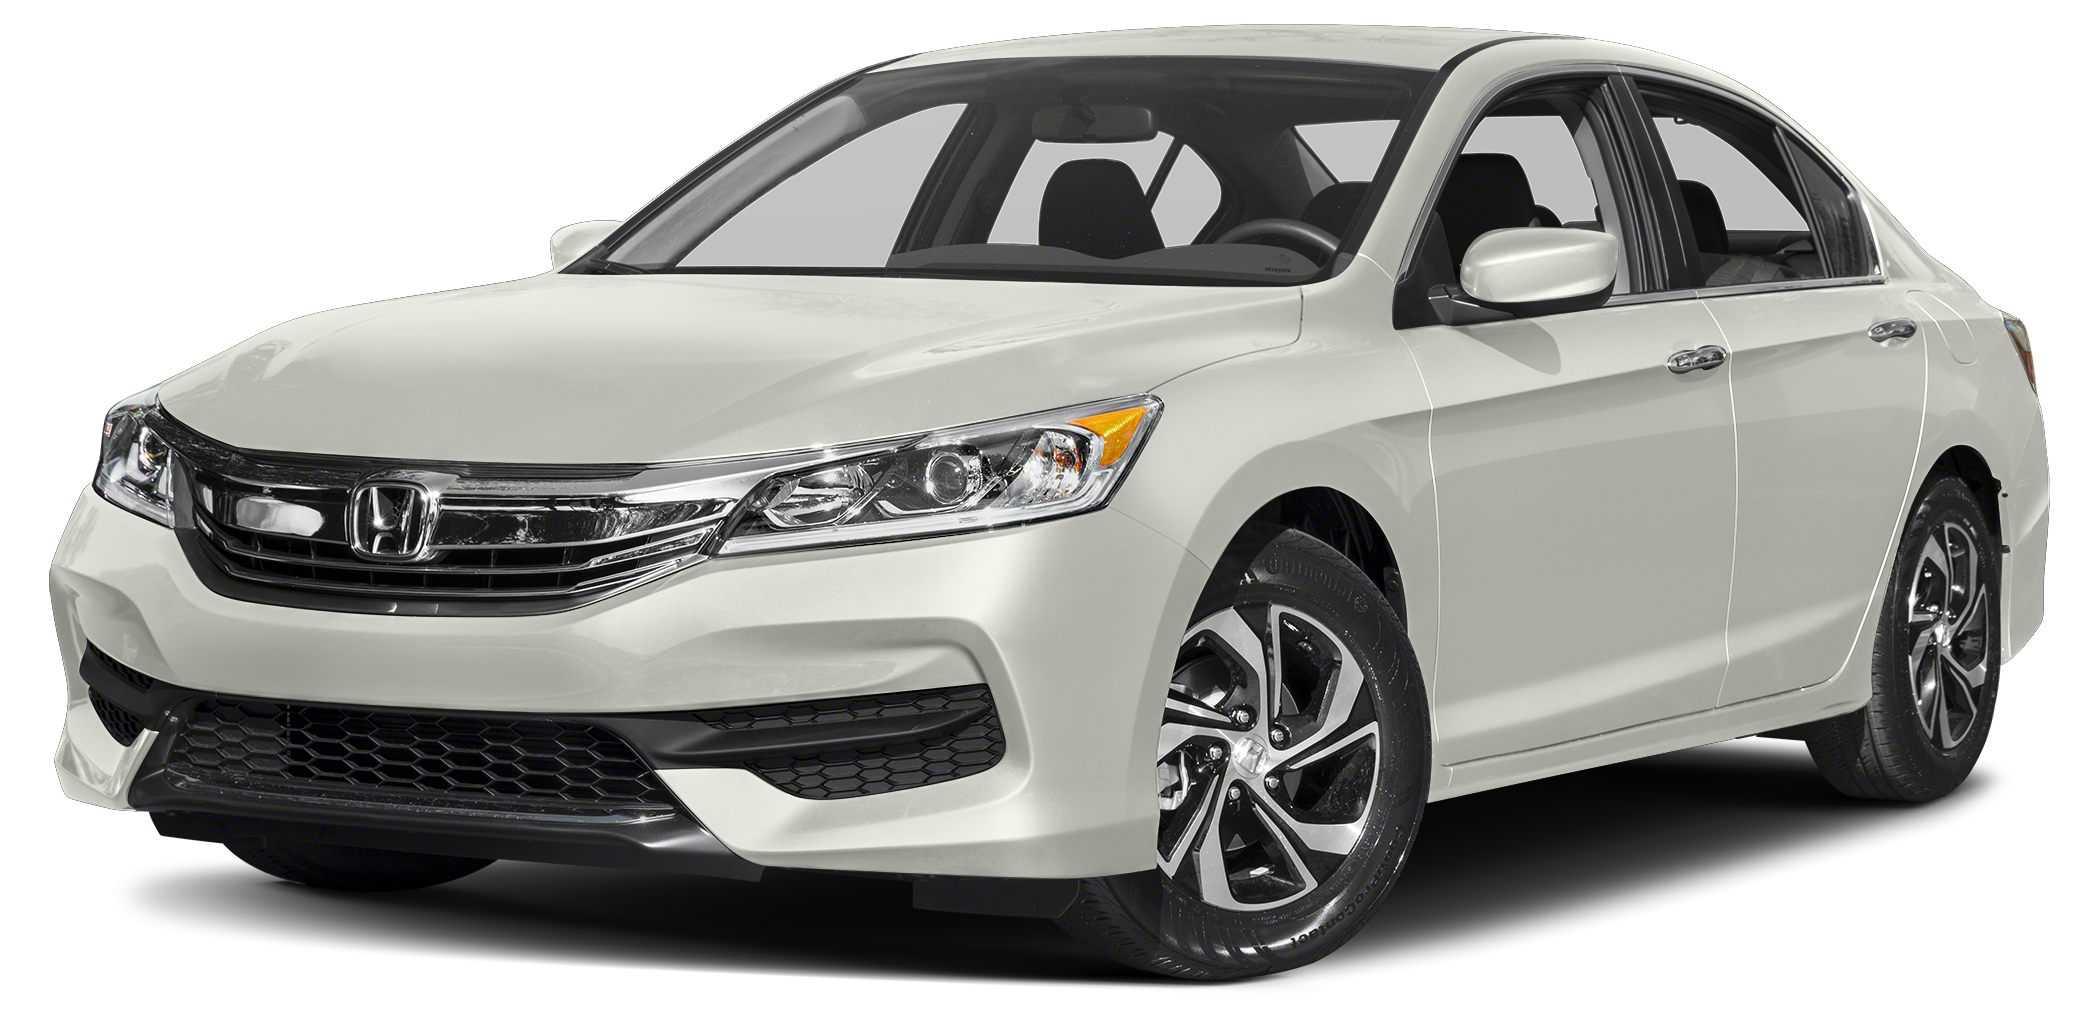 2017 honda accord for sale in waldorf md 1hgcr2f39ha224438 for Honda dealership waldorf md